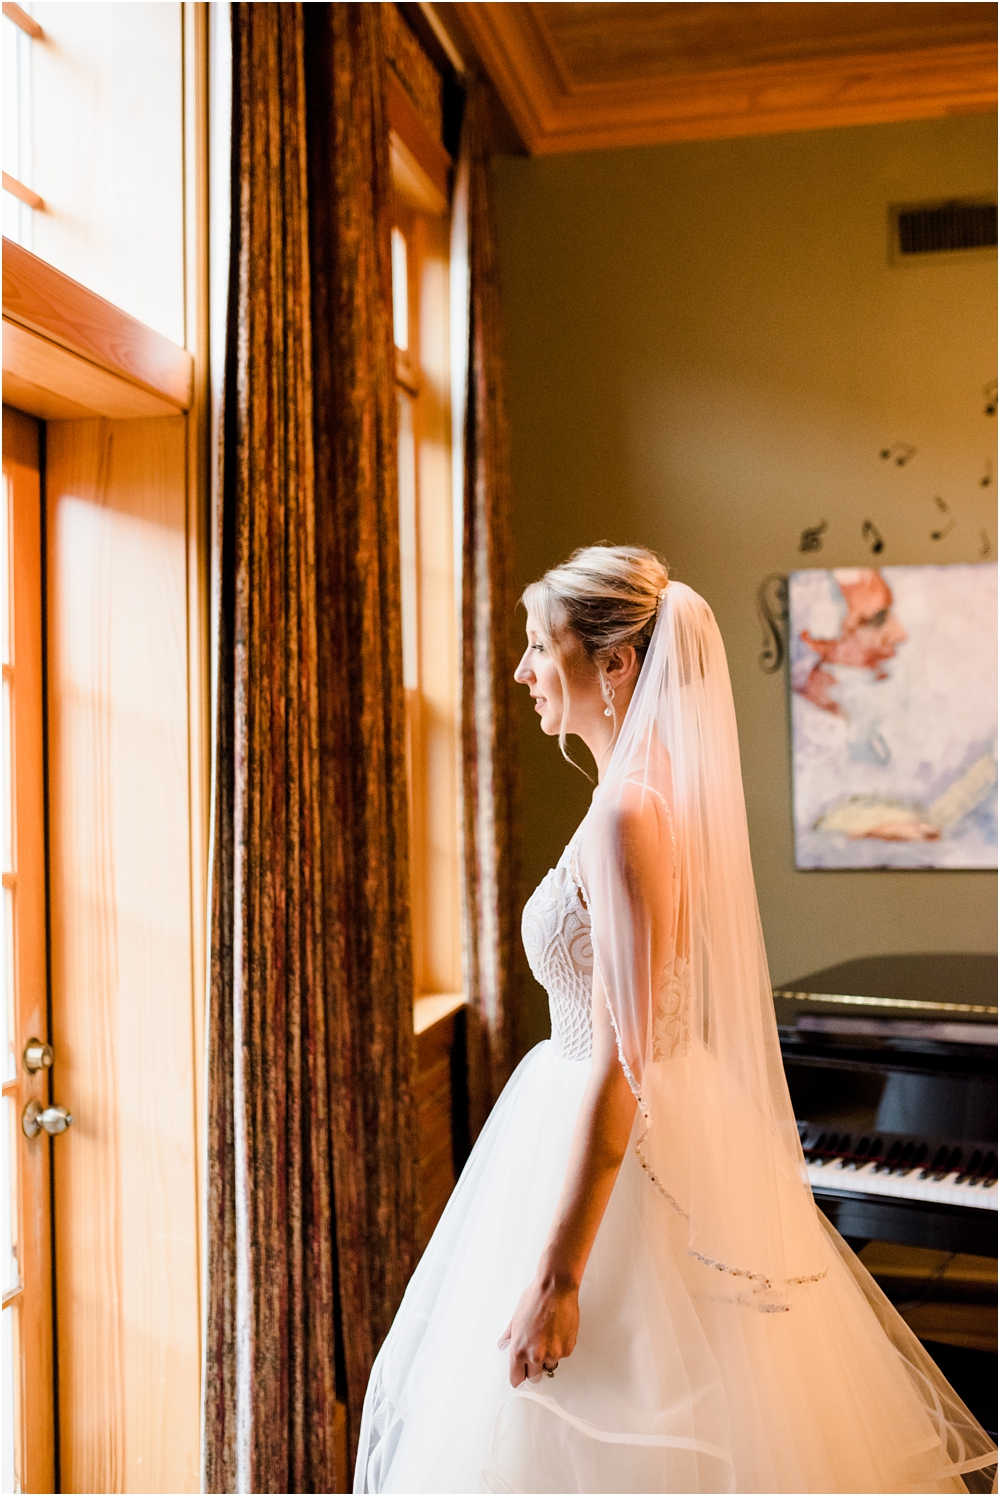 oconnor-pensacola-florida-wedding-photographer-kiersten-taylor-31.jpg